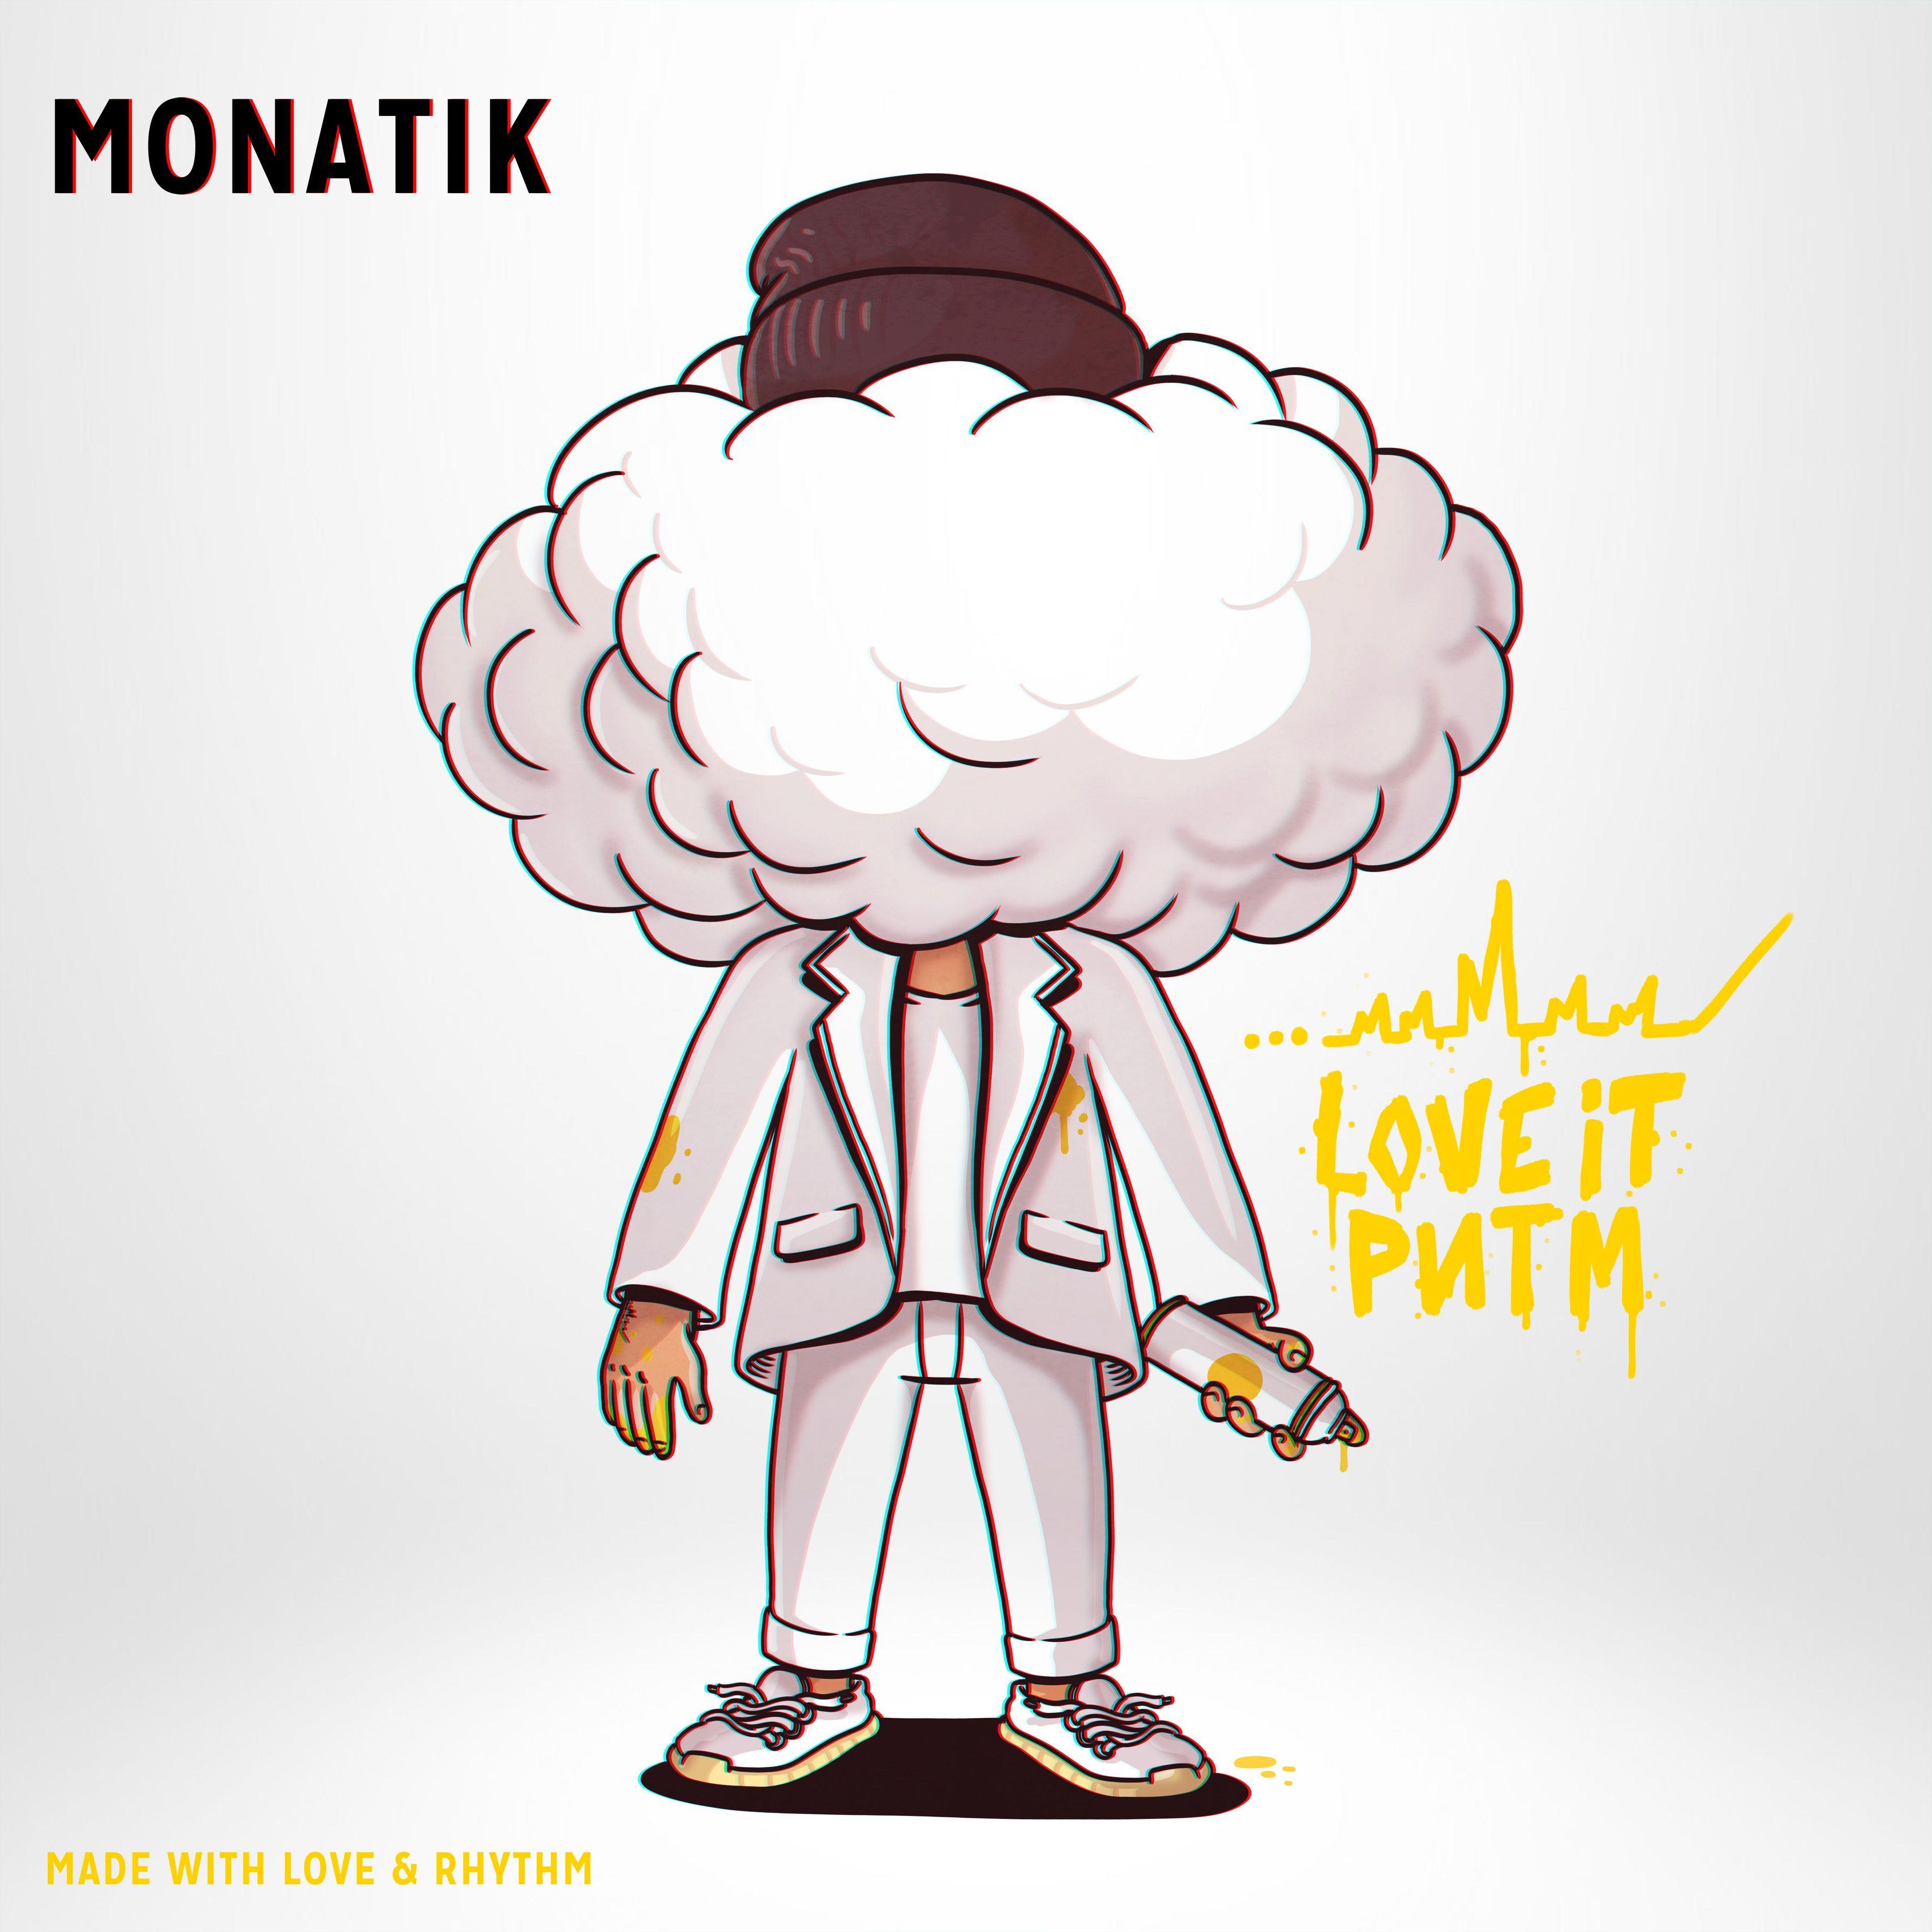 Monatik Love Itритм— Монатик выпустил новый альбом— слушать онлайн